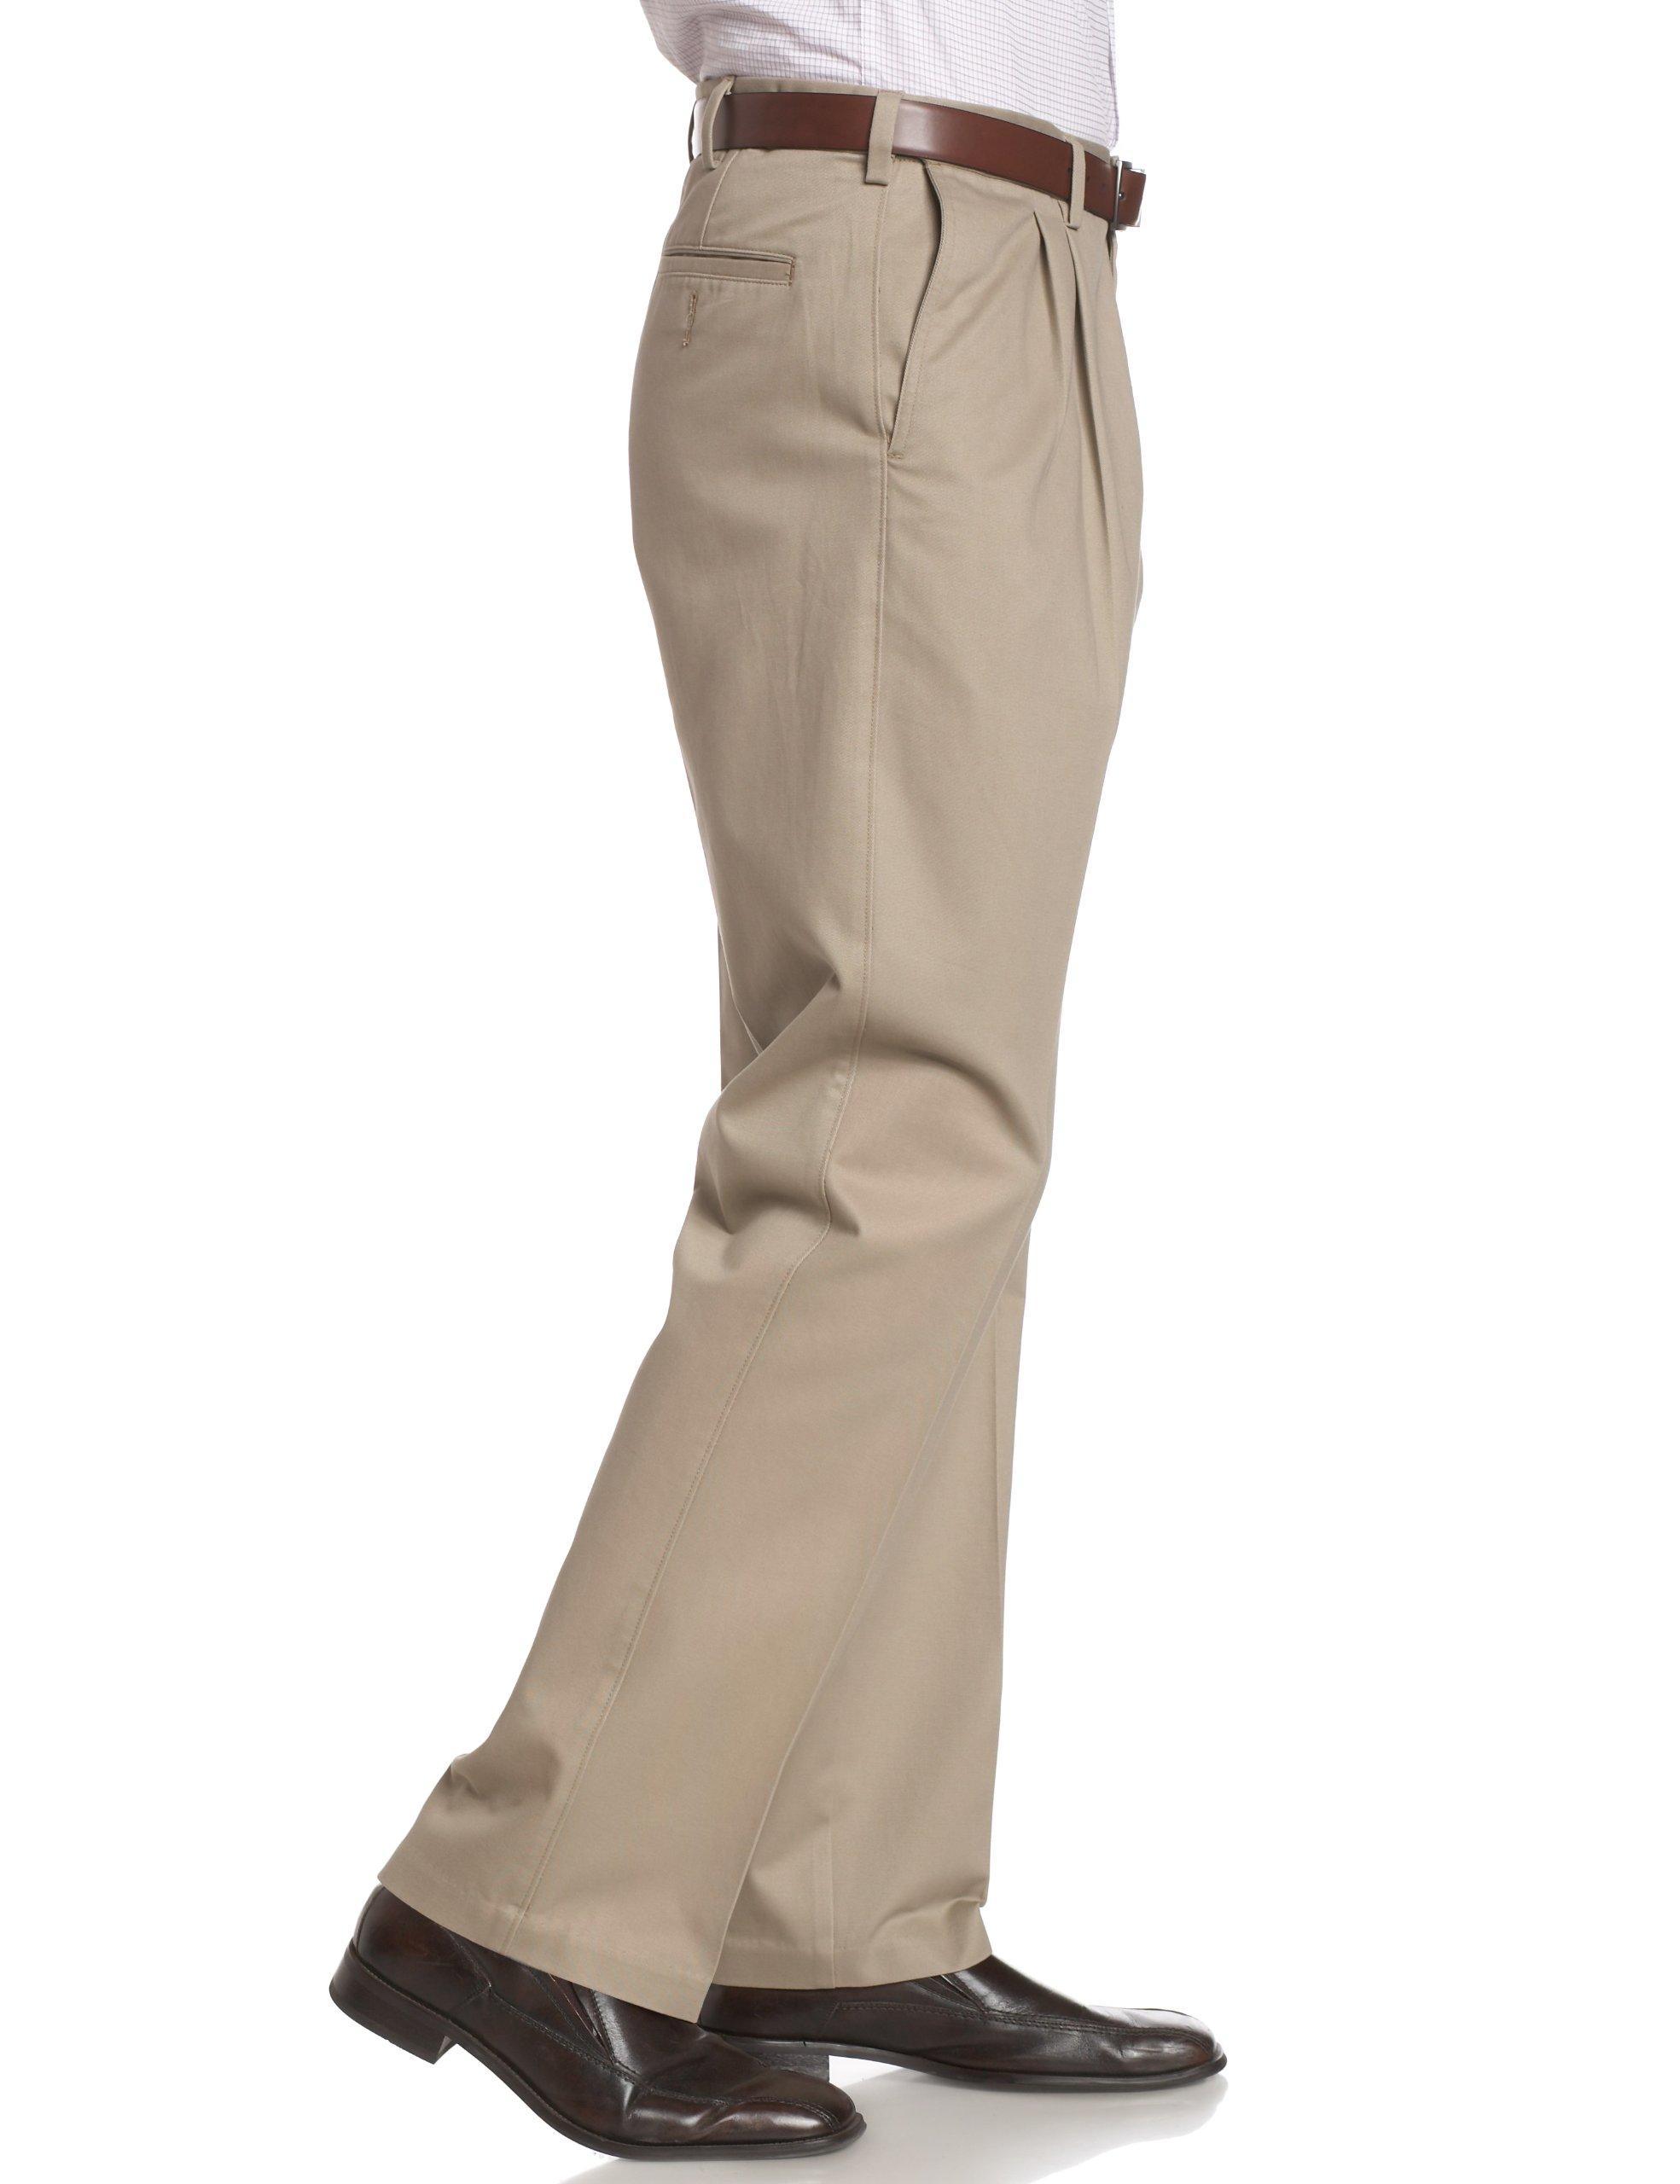 Savane Men's Pleated Wrinkle Free Twill,Khaki,42W 32L by Savane (Image #3)